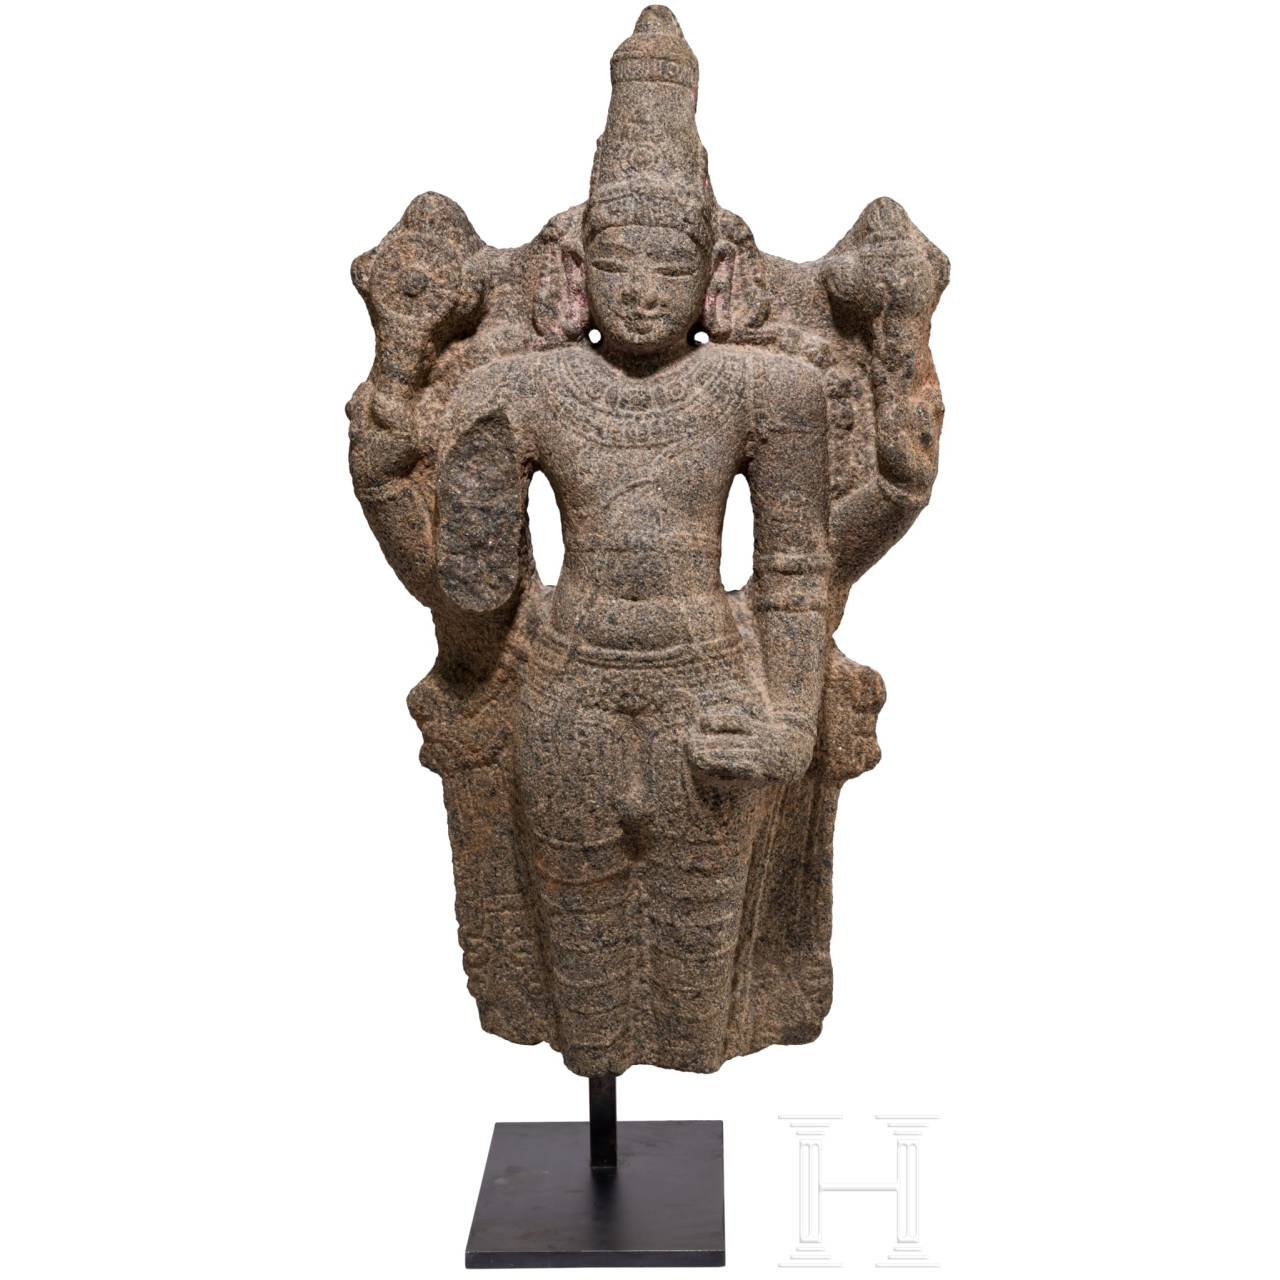 Früher stehender Vishnu im Cholastil, Südindien, 13. Jhdt.